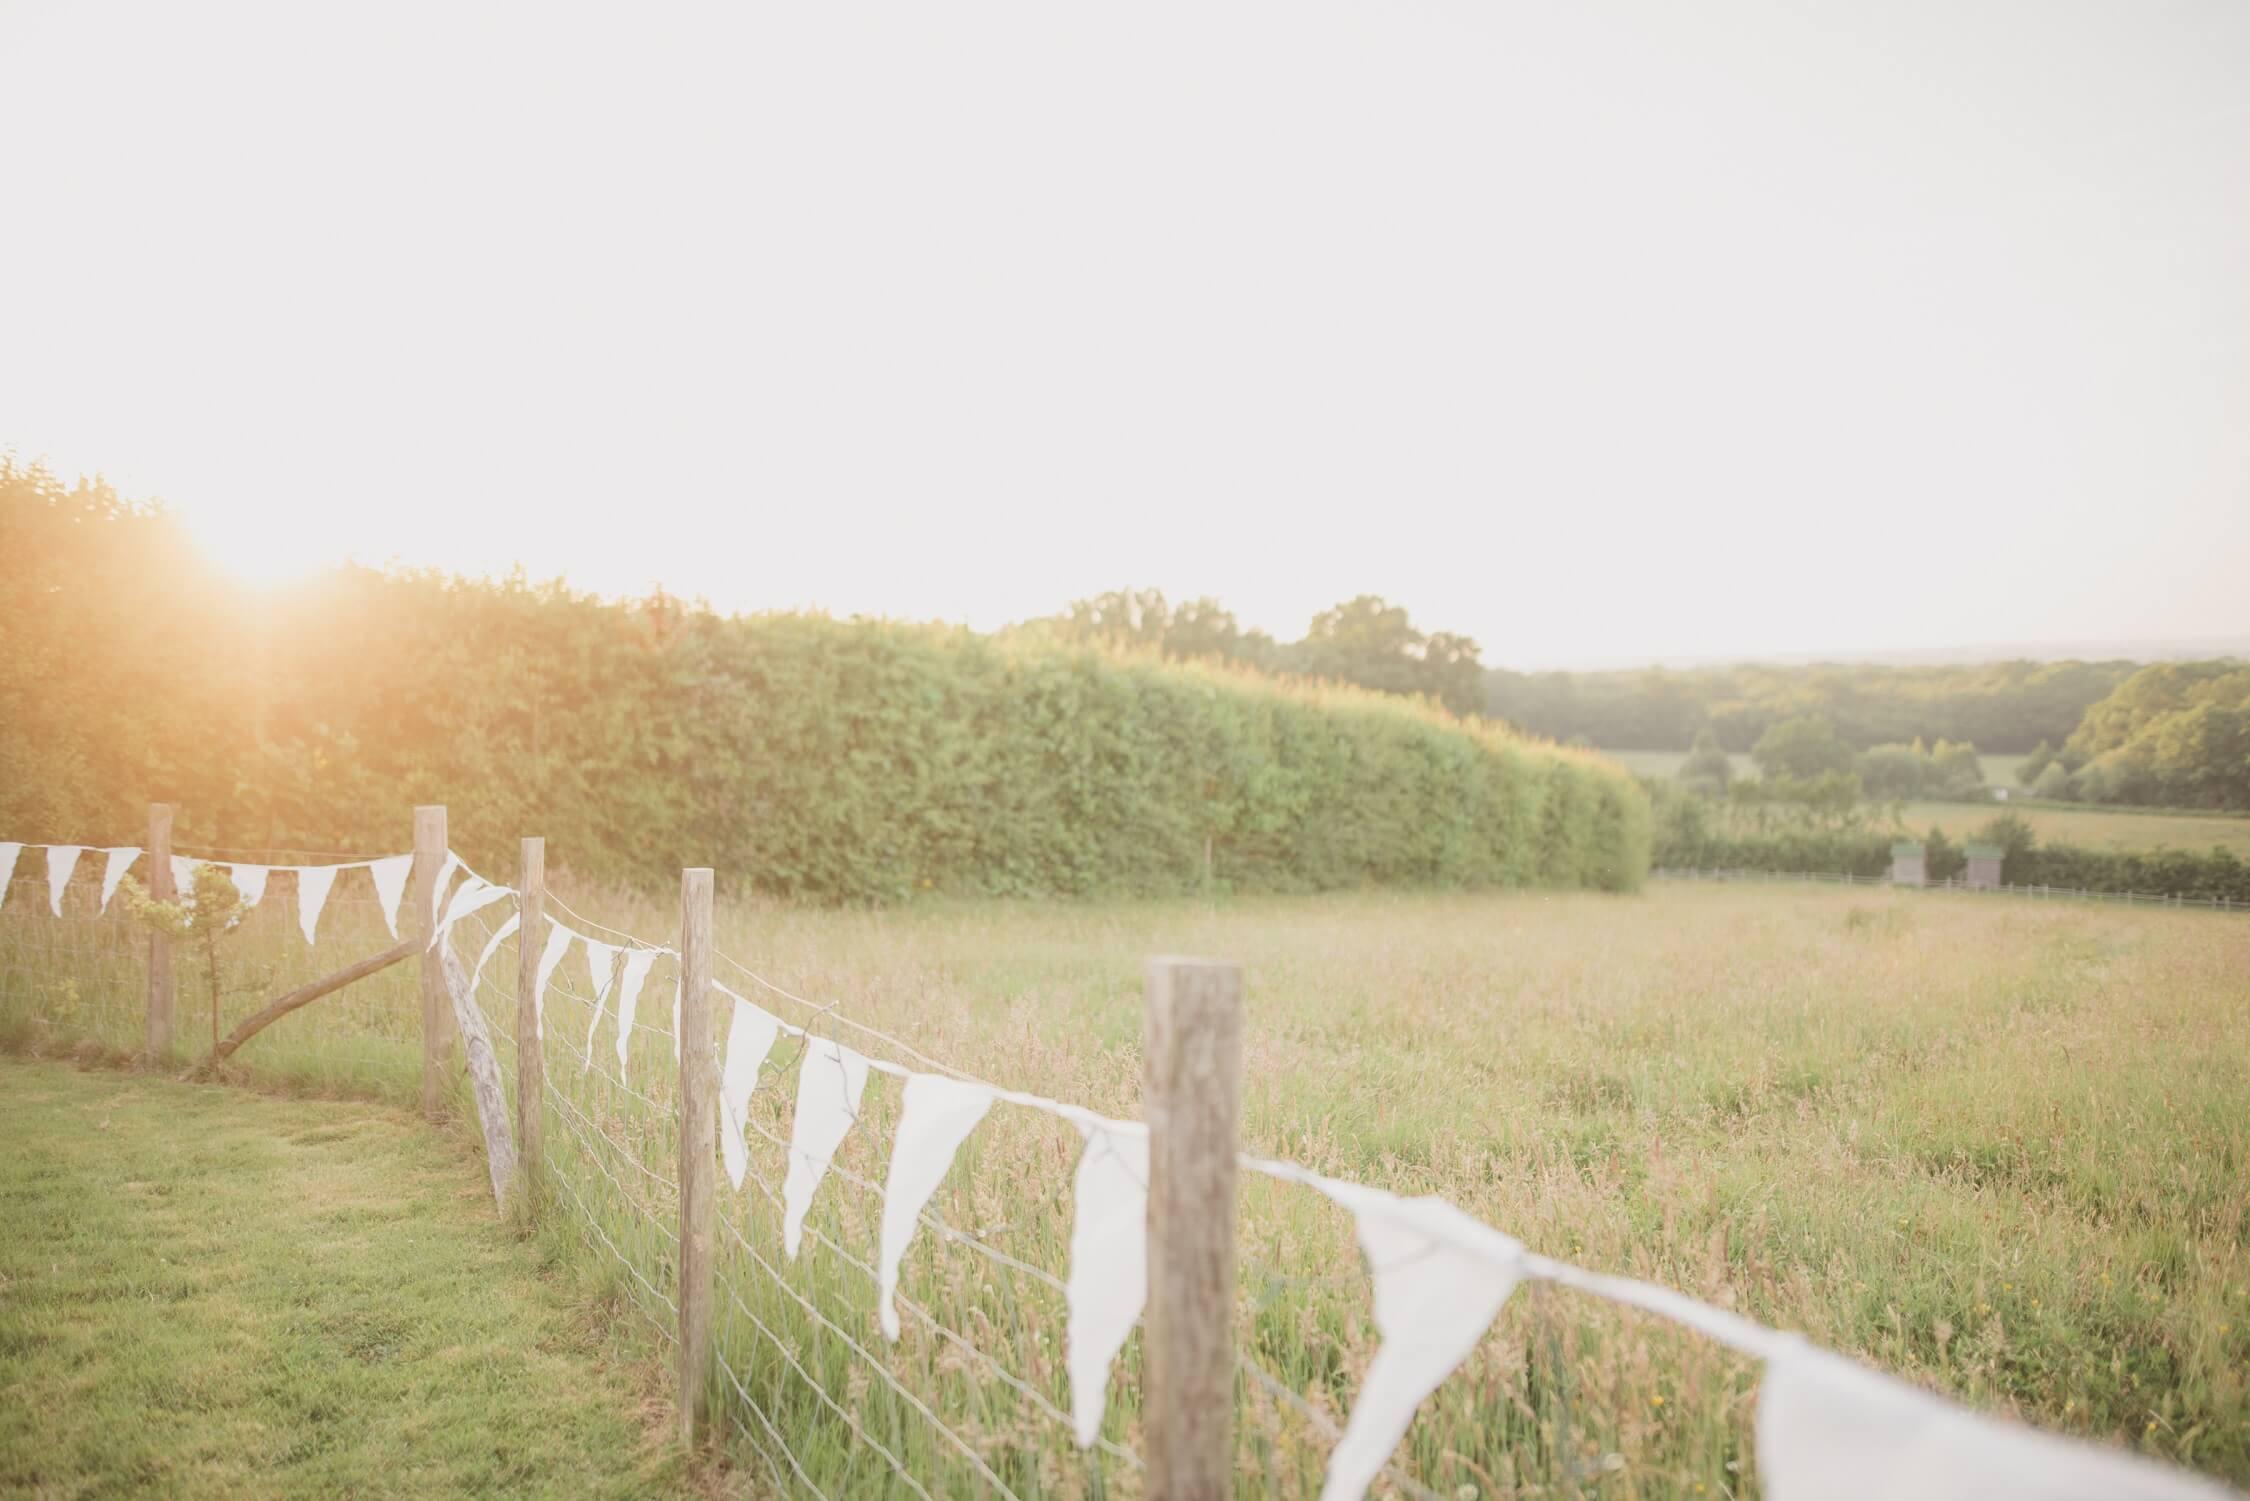 Swallowtail Hill farm - Surrounding fields